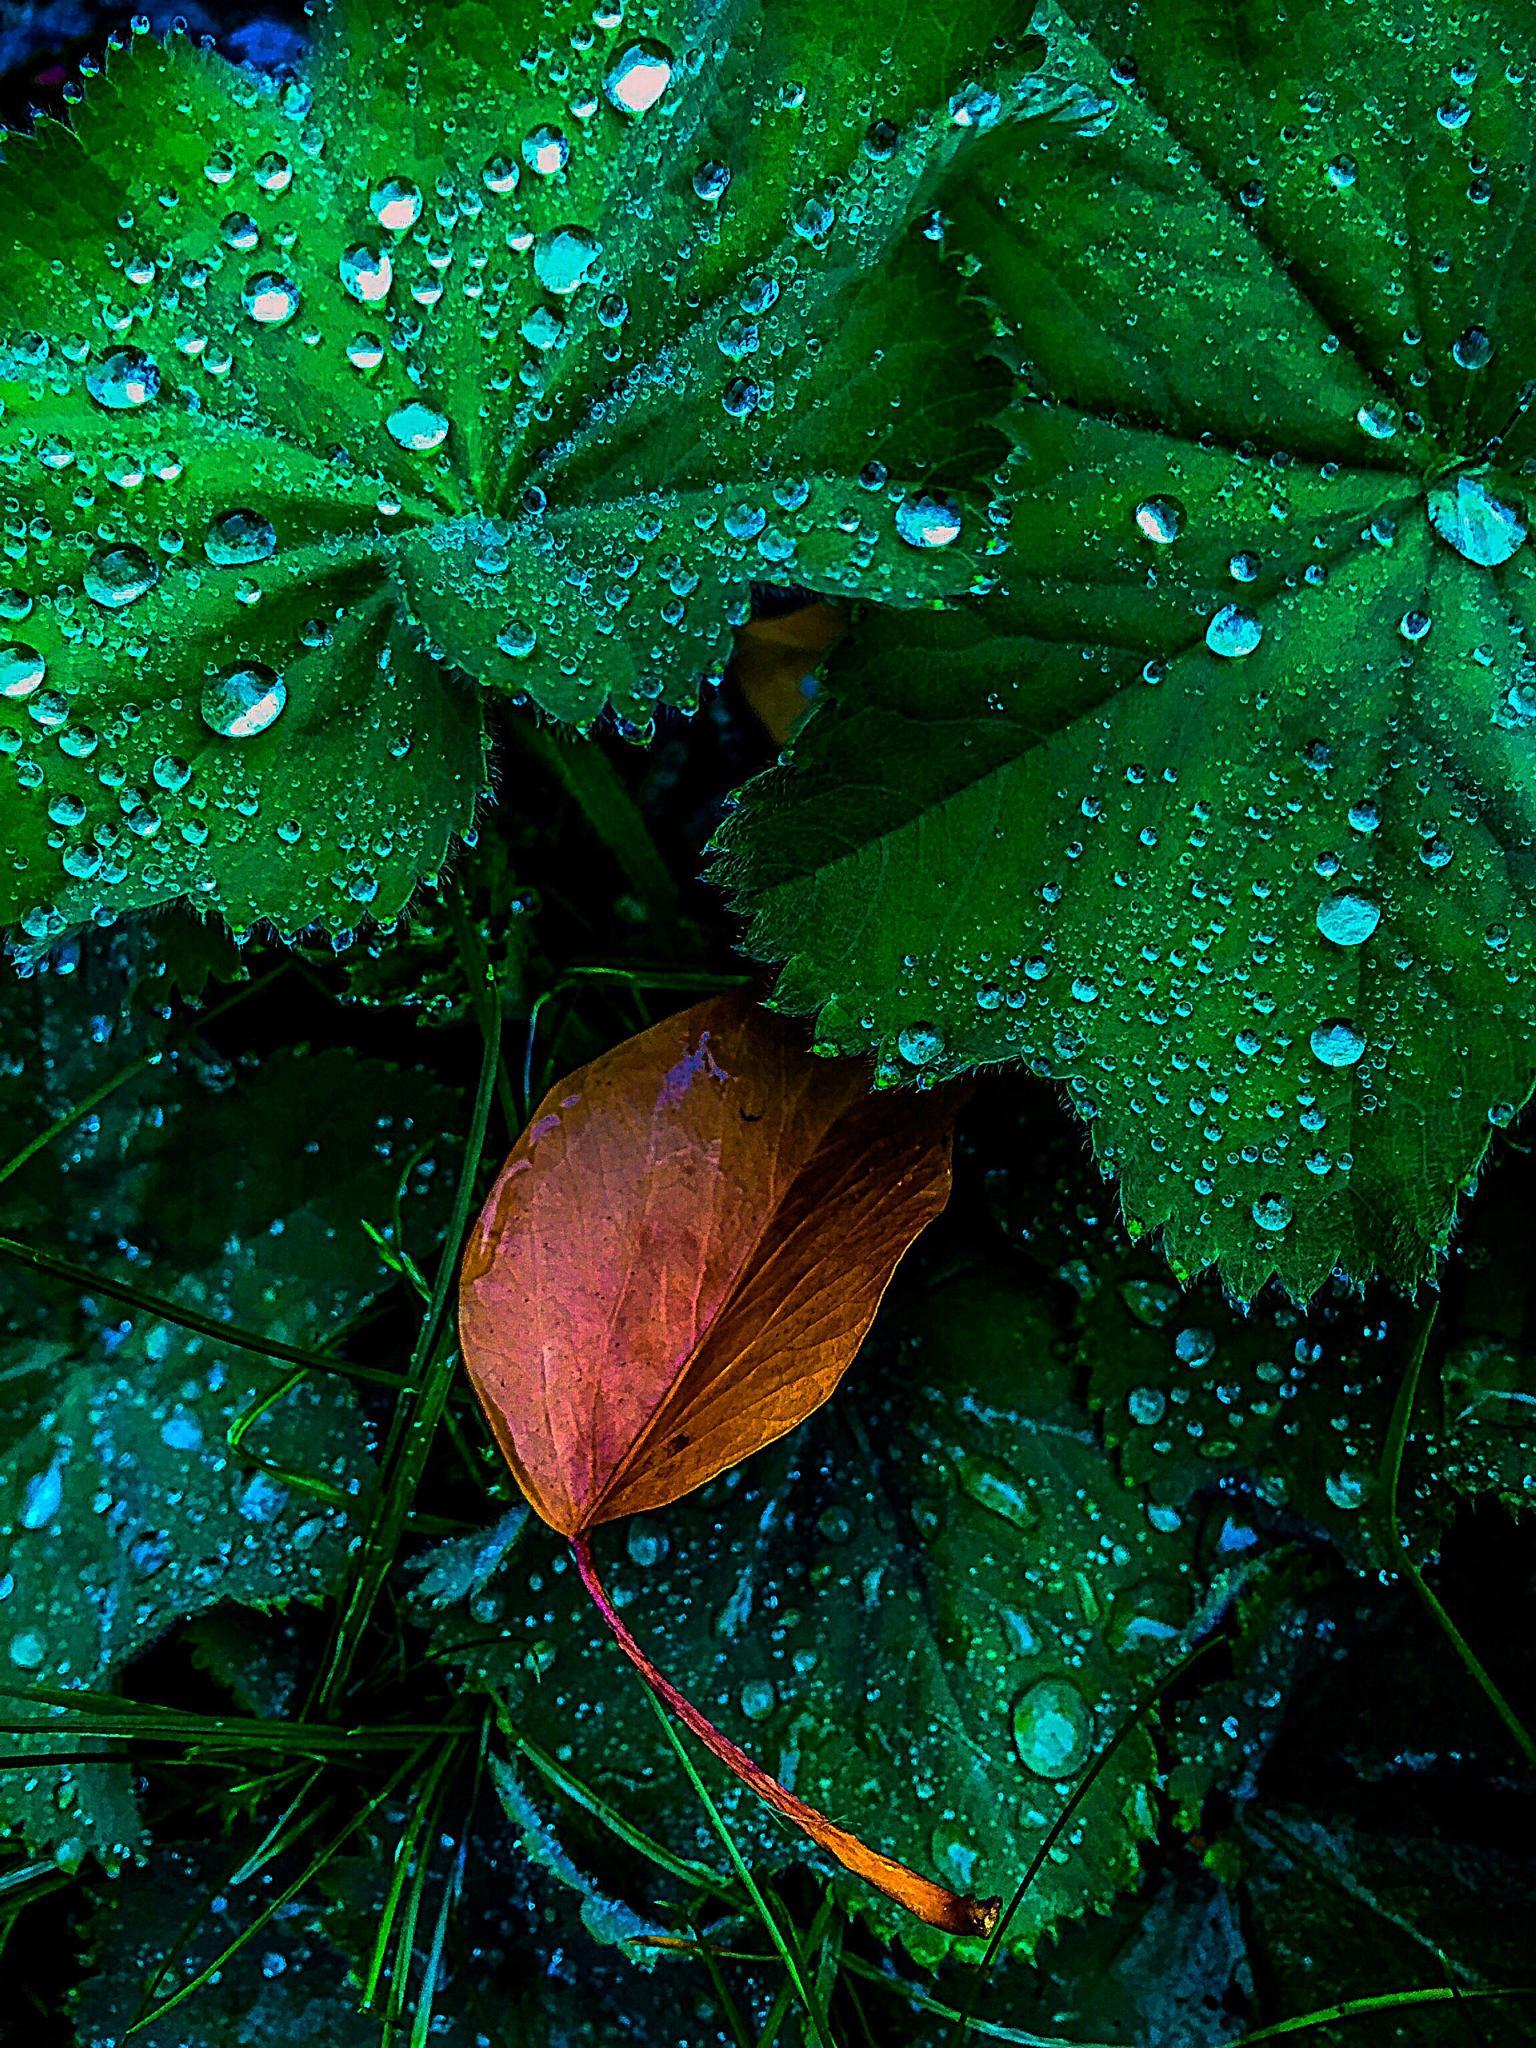 Little brown leaf by RONNIE ERICSON